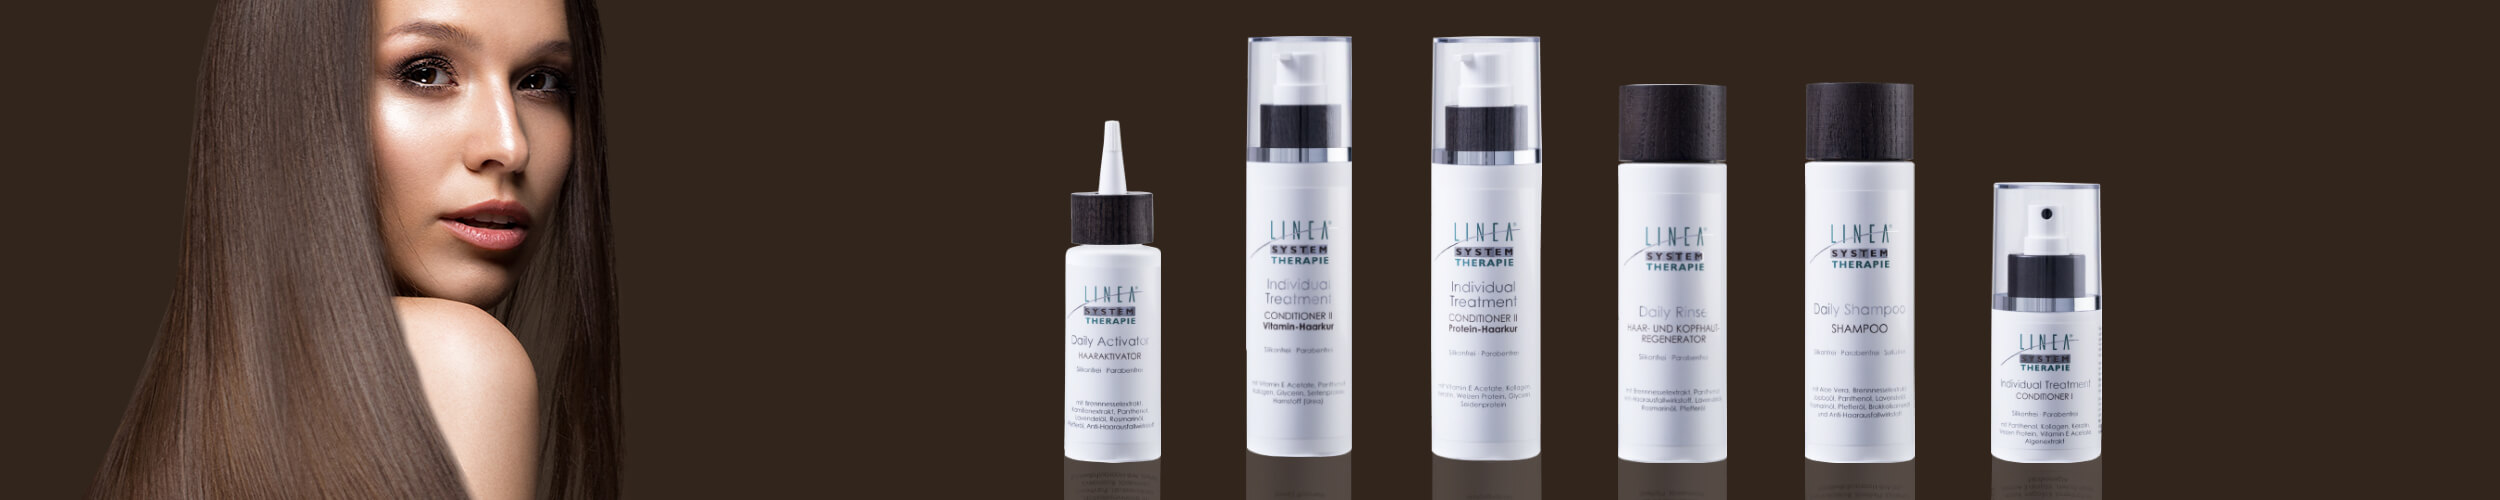 Linea Haartherapie Lines System Alle Produkte